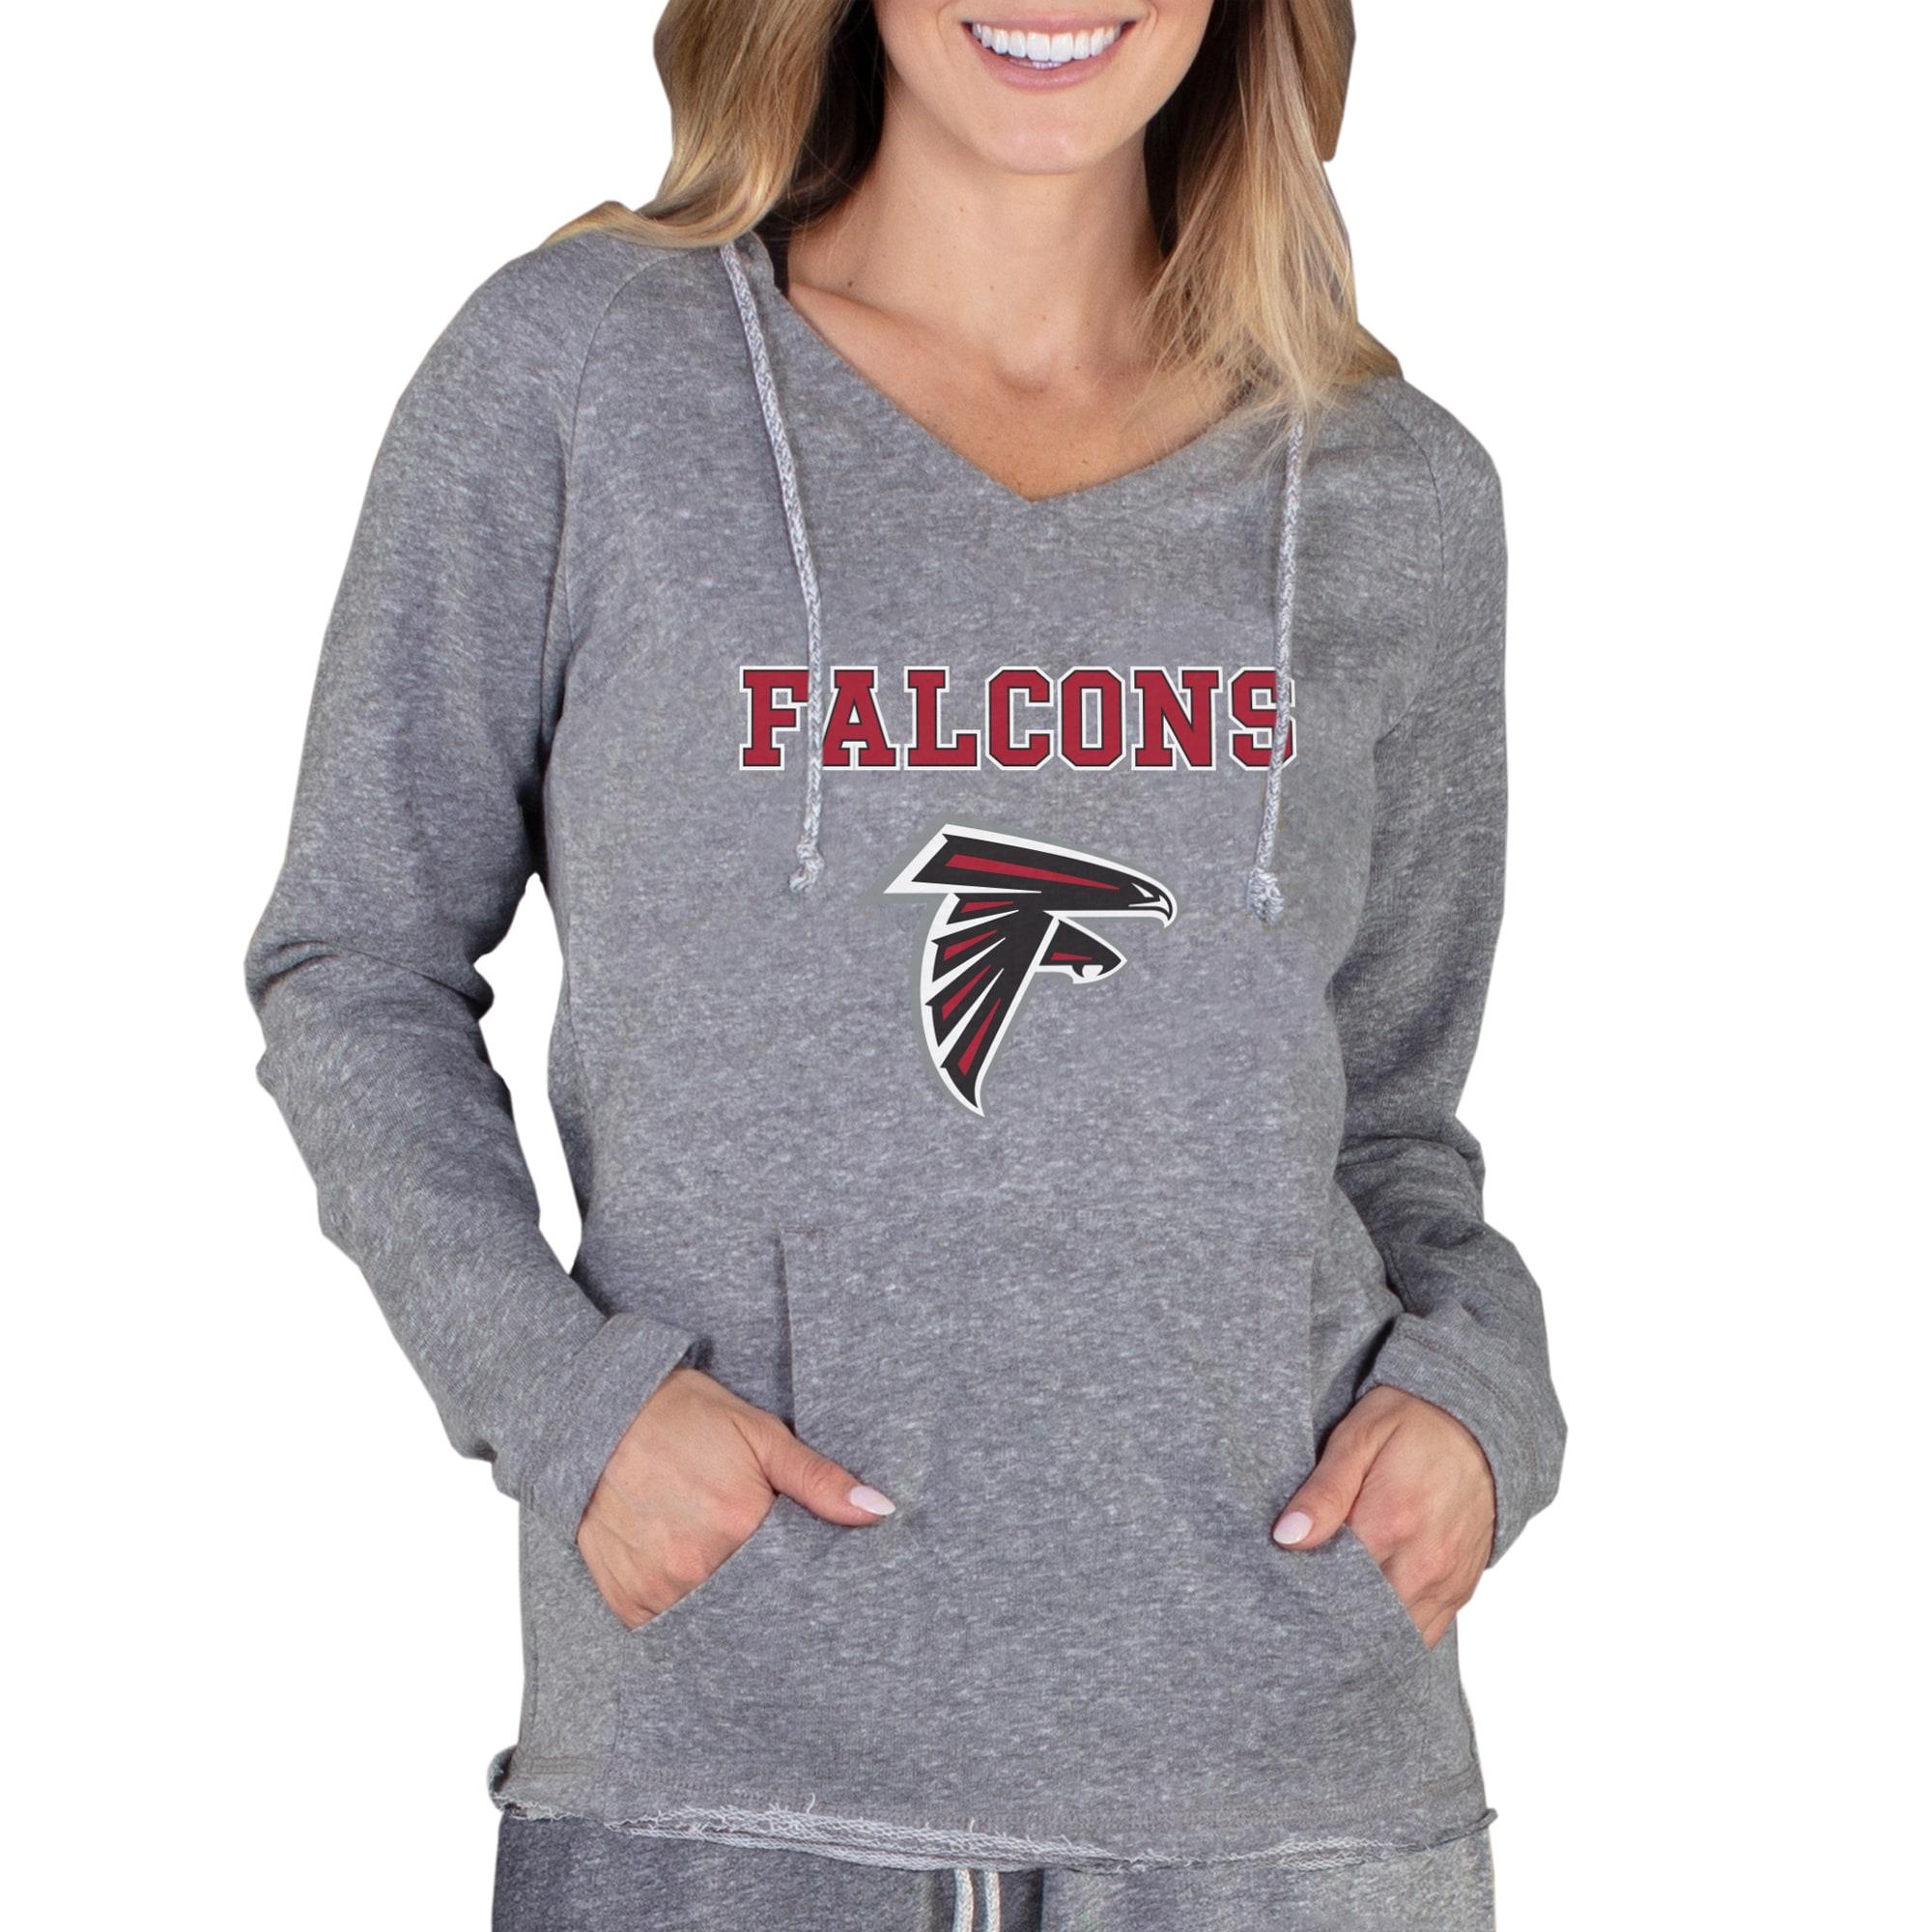 Atlanta Falcons Concepts Sport Women's Mainstream Hooded Long Sleeve V-Neck Top - Gray